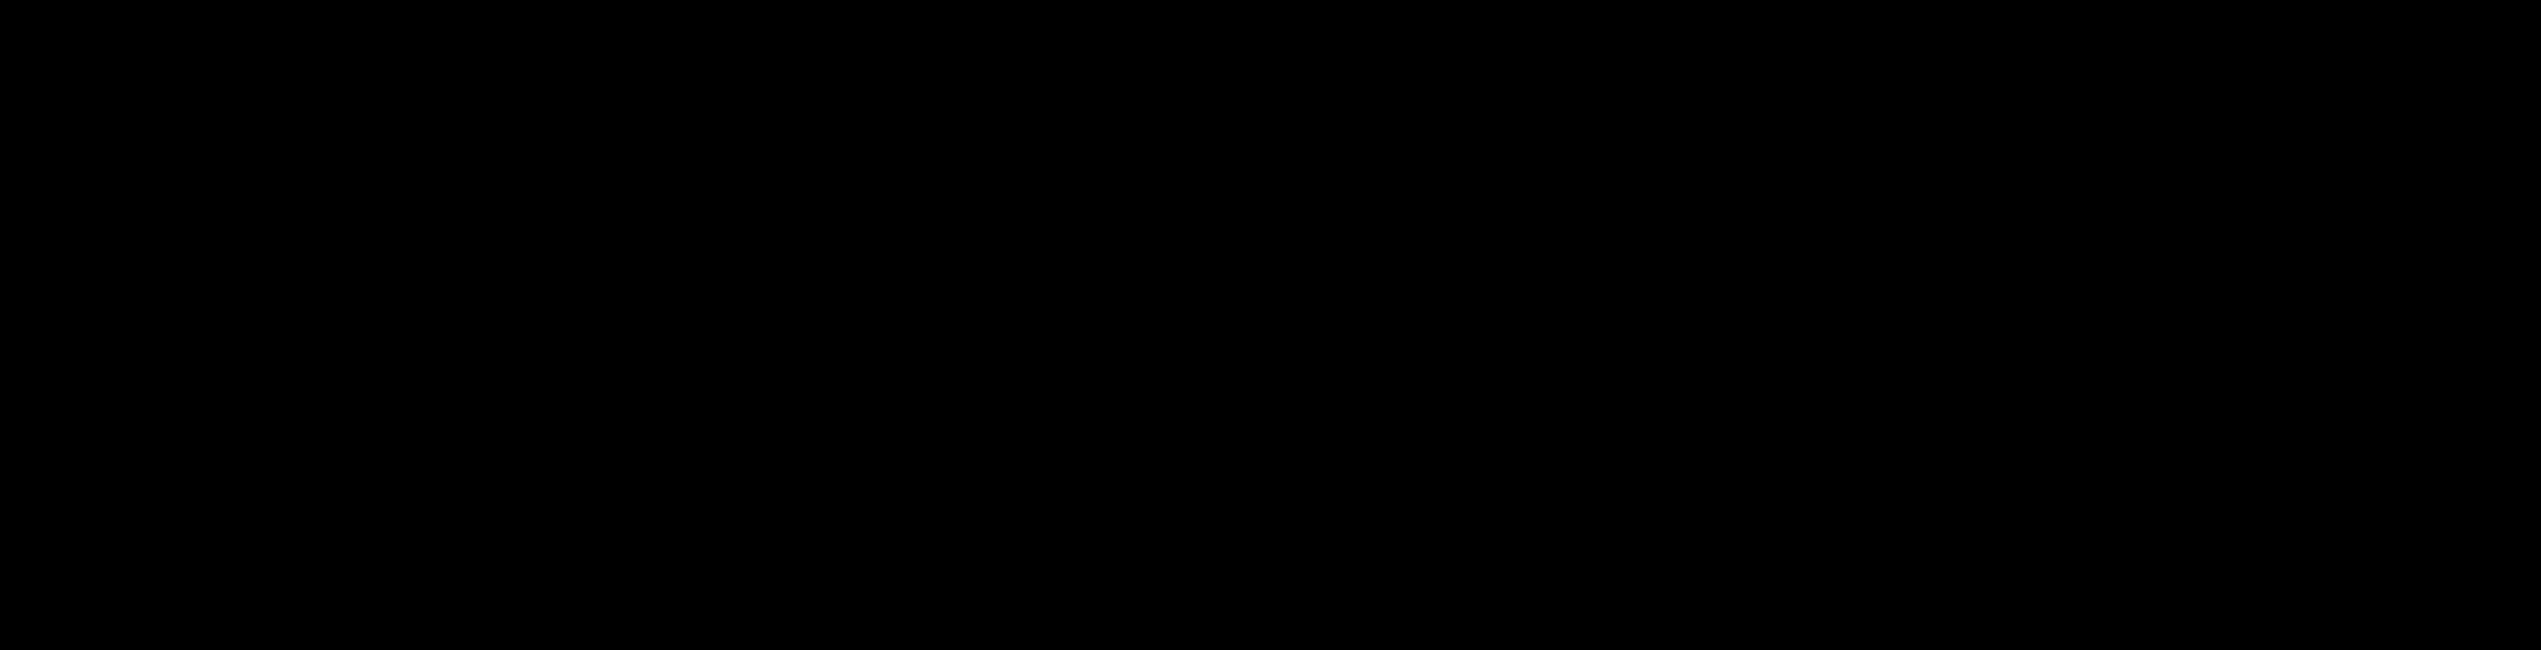 beaglekick-logo_RGB_unit-black.png